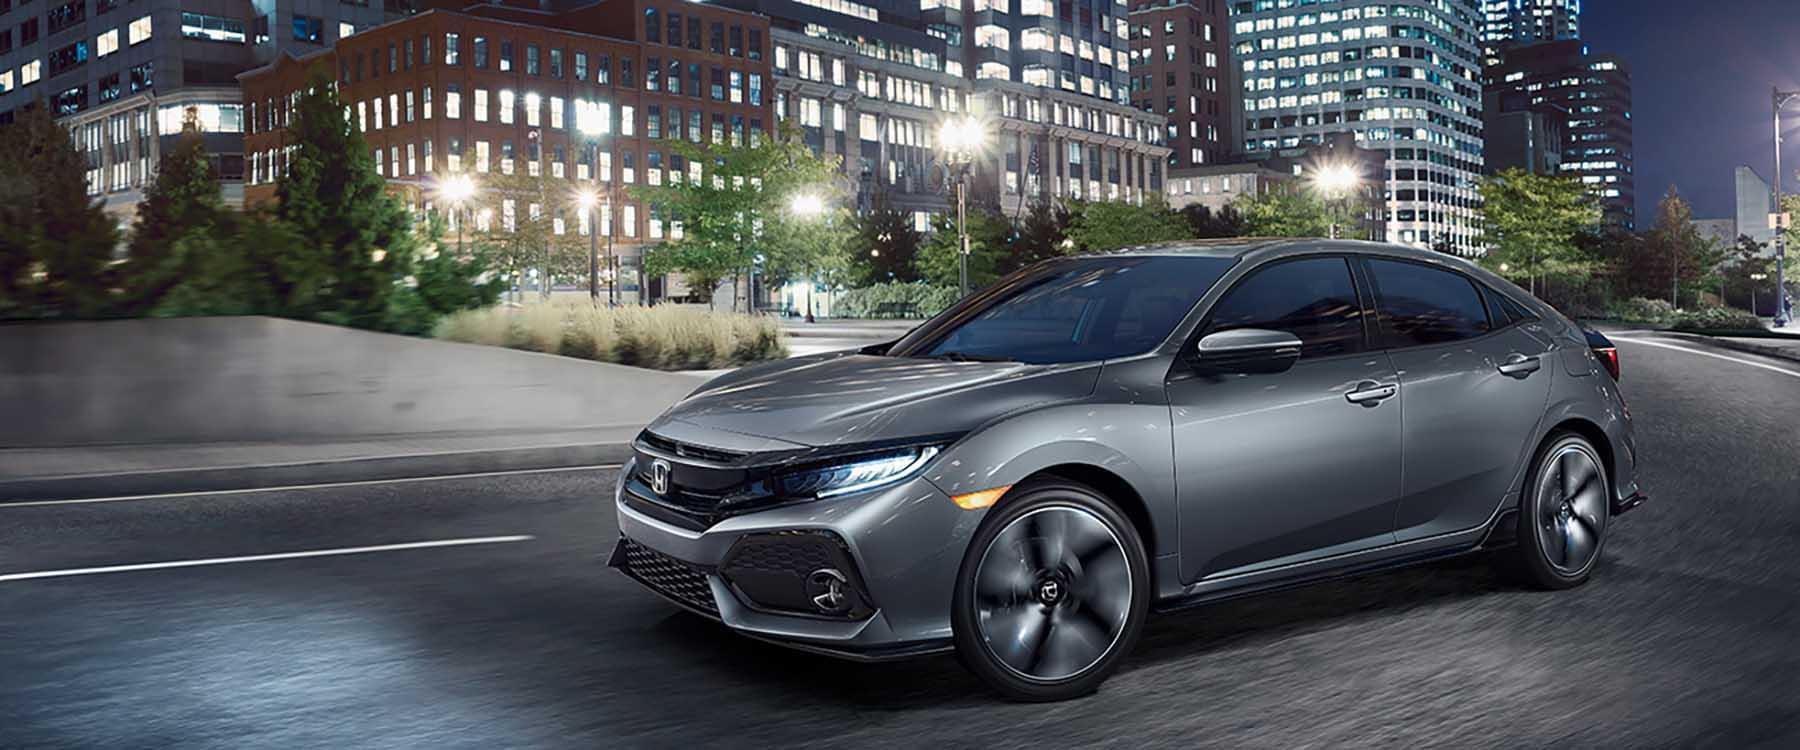 2017 Honda Civic Hatchback Driving